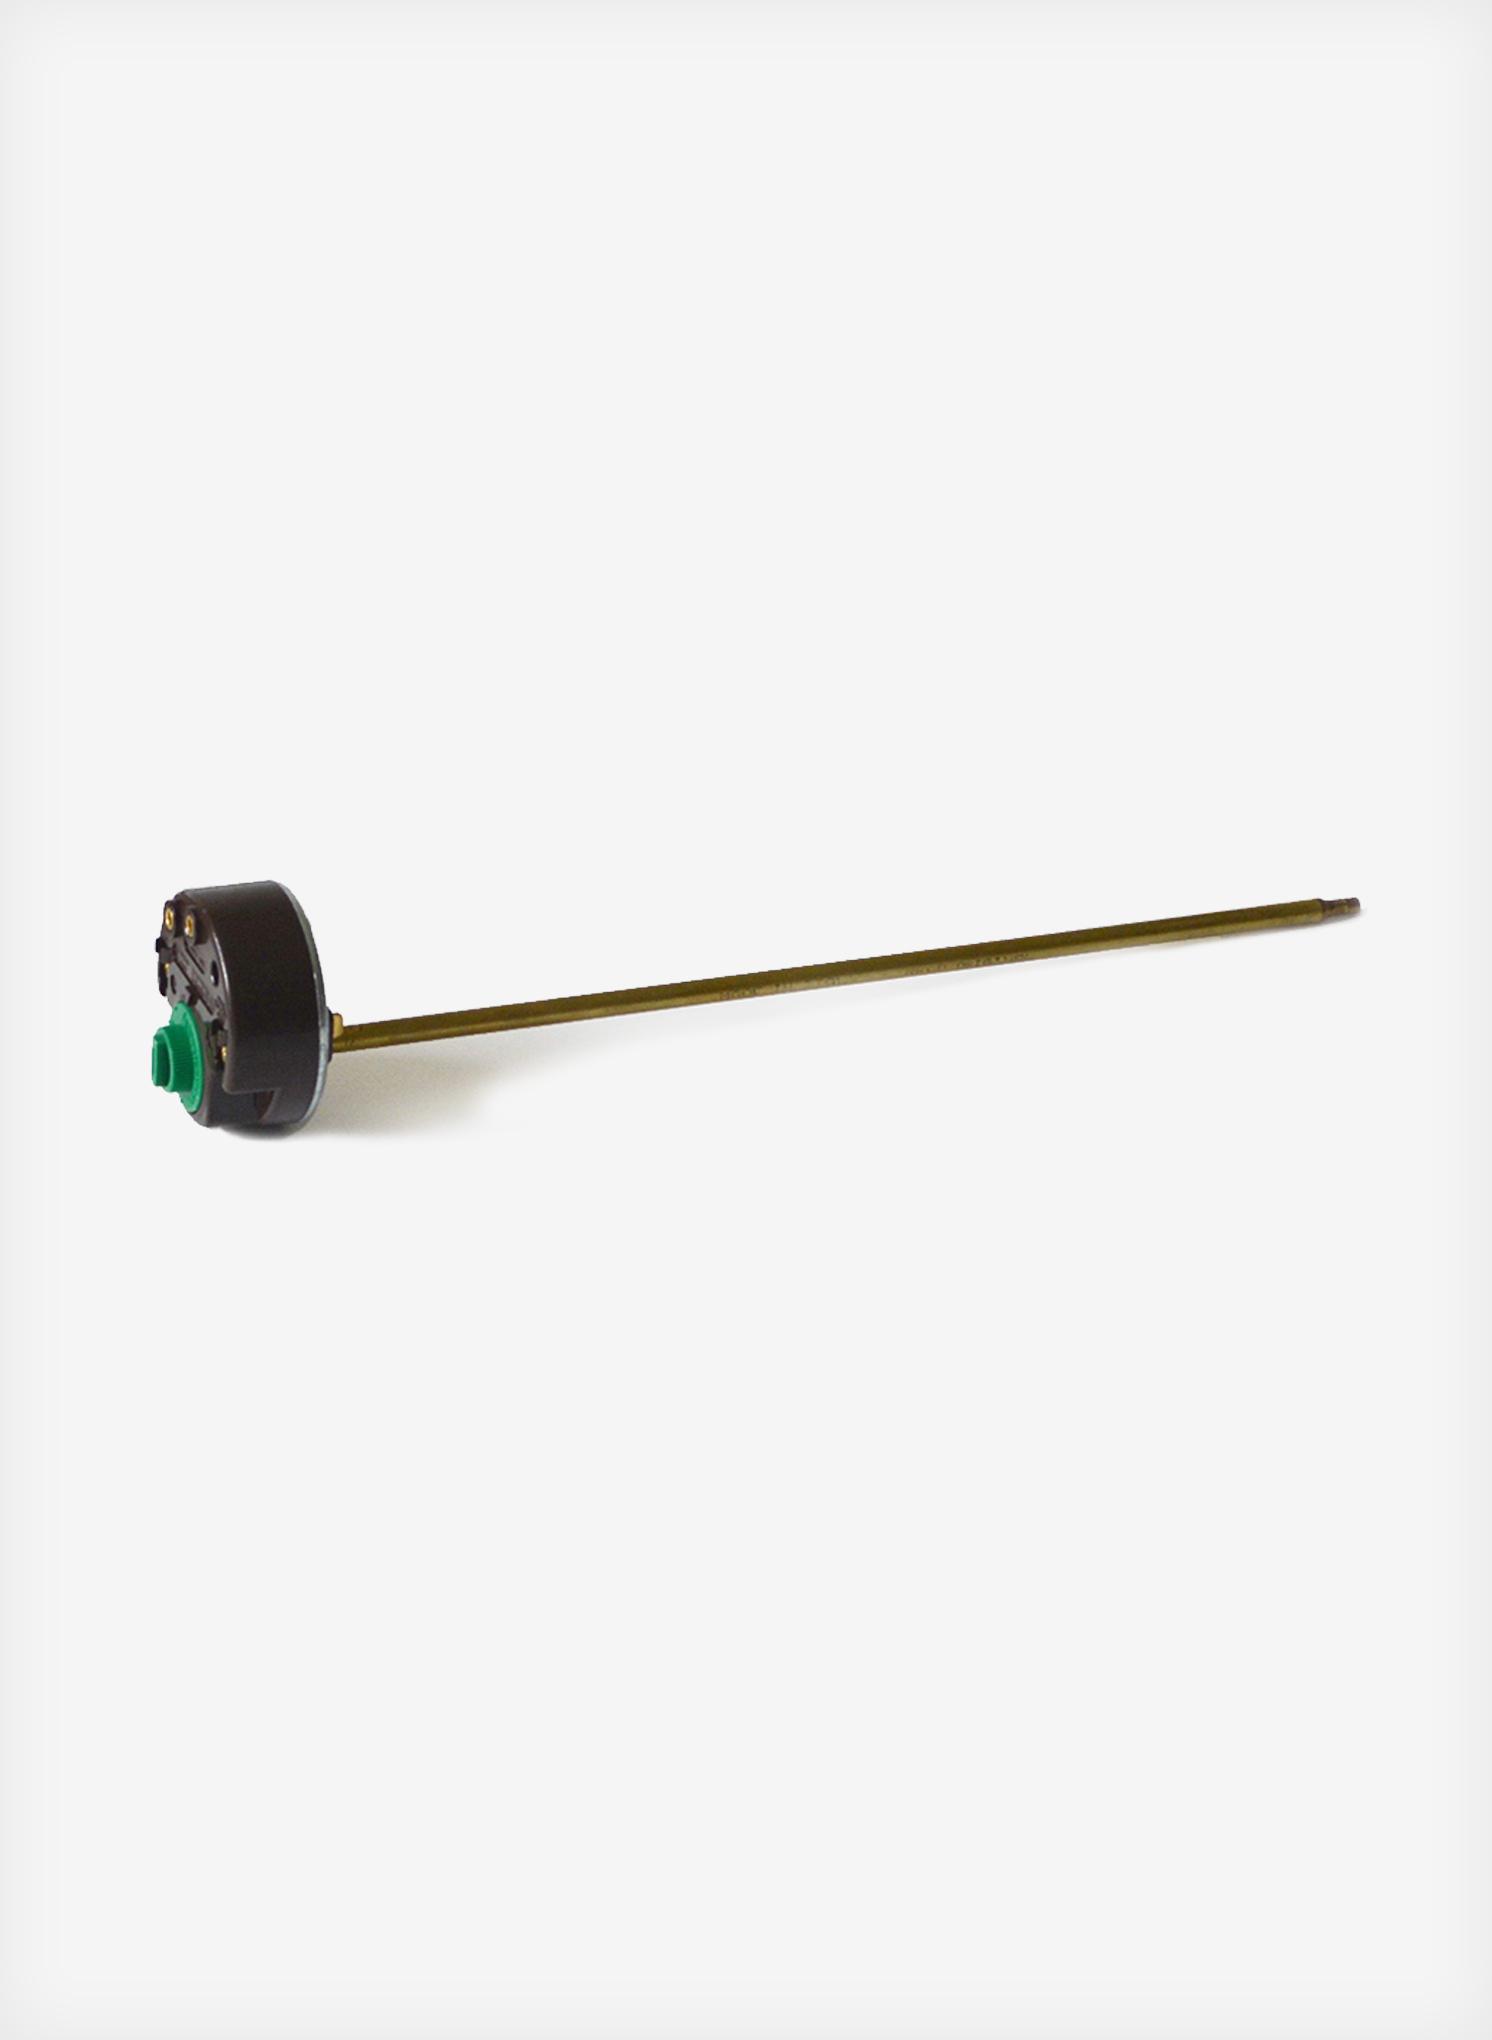 Termostato enchufable termotanque electrico reco termocontroles